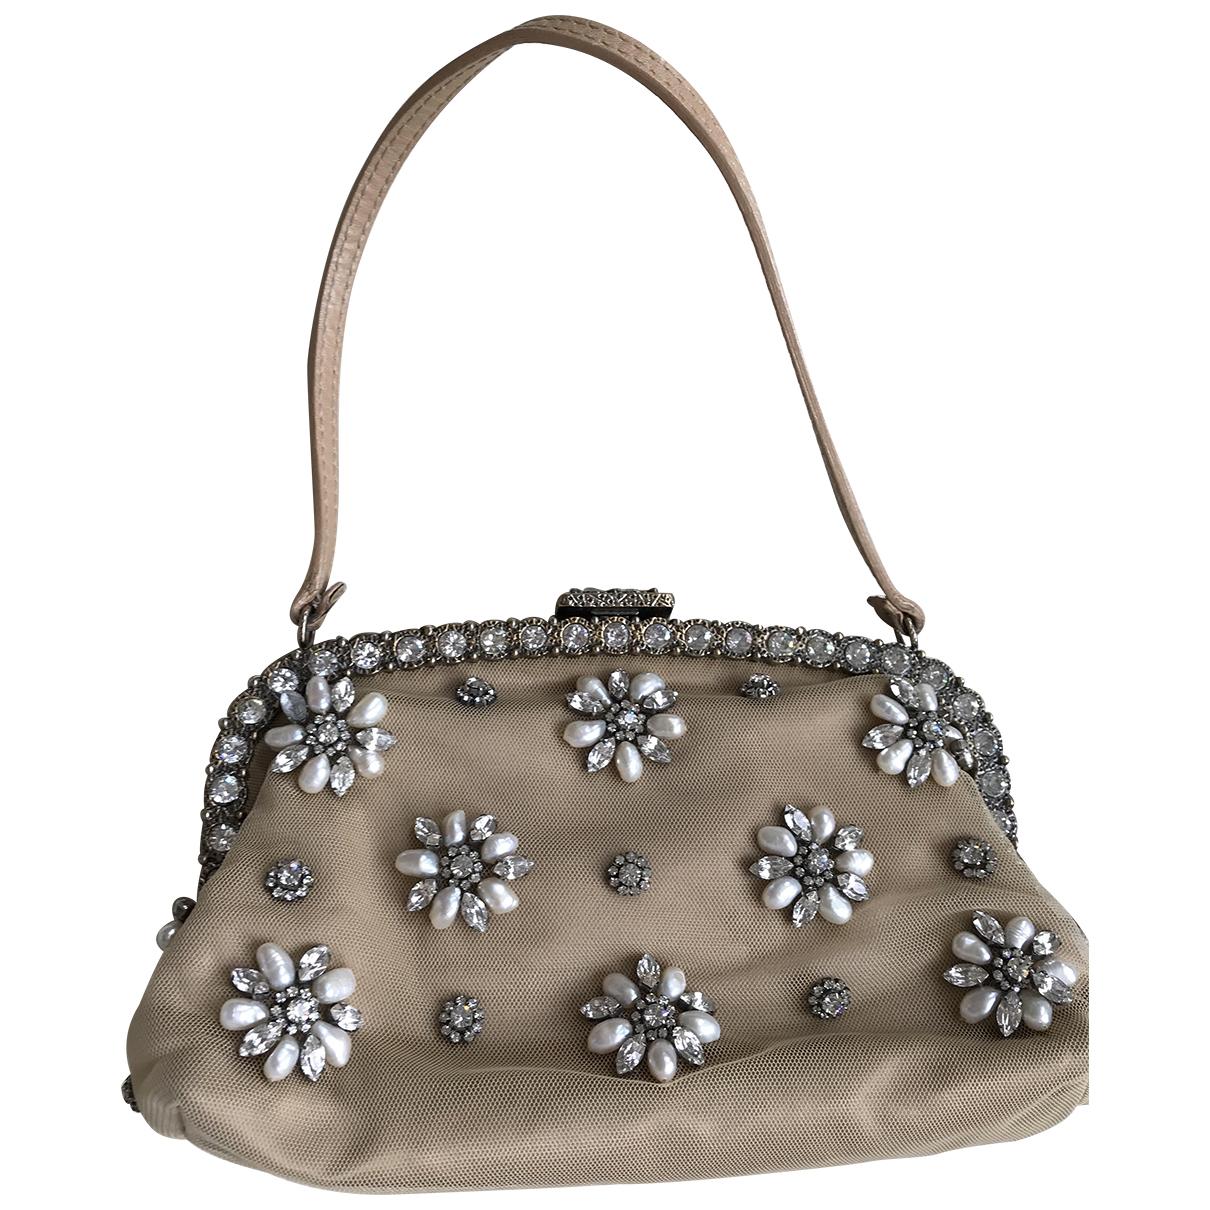 Valentino Garavani N Beige Cloth Clutch bag for Women N